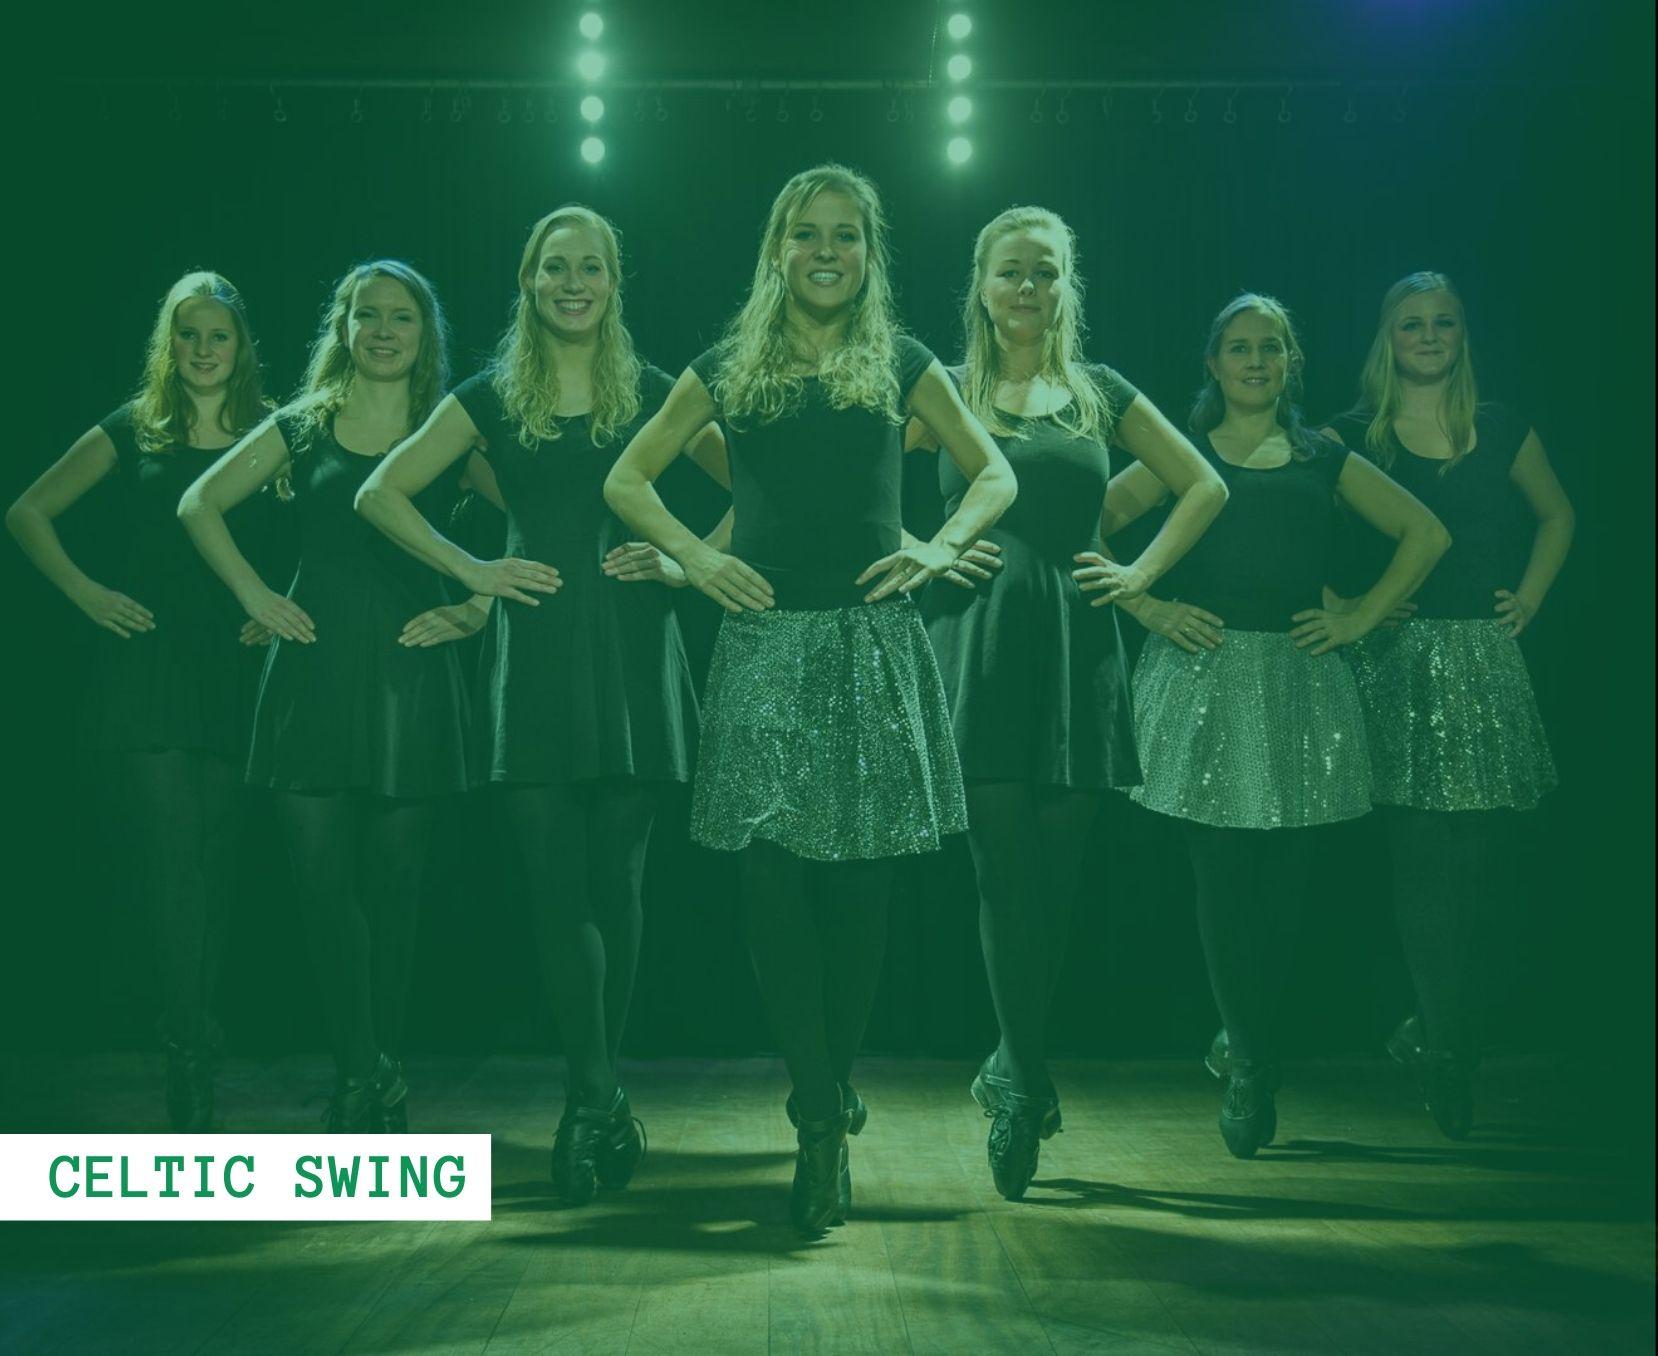 celtic swing - st patricks day 2020 the hague